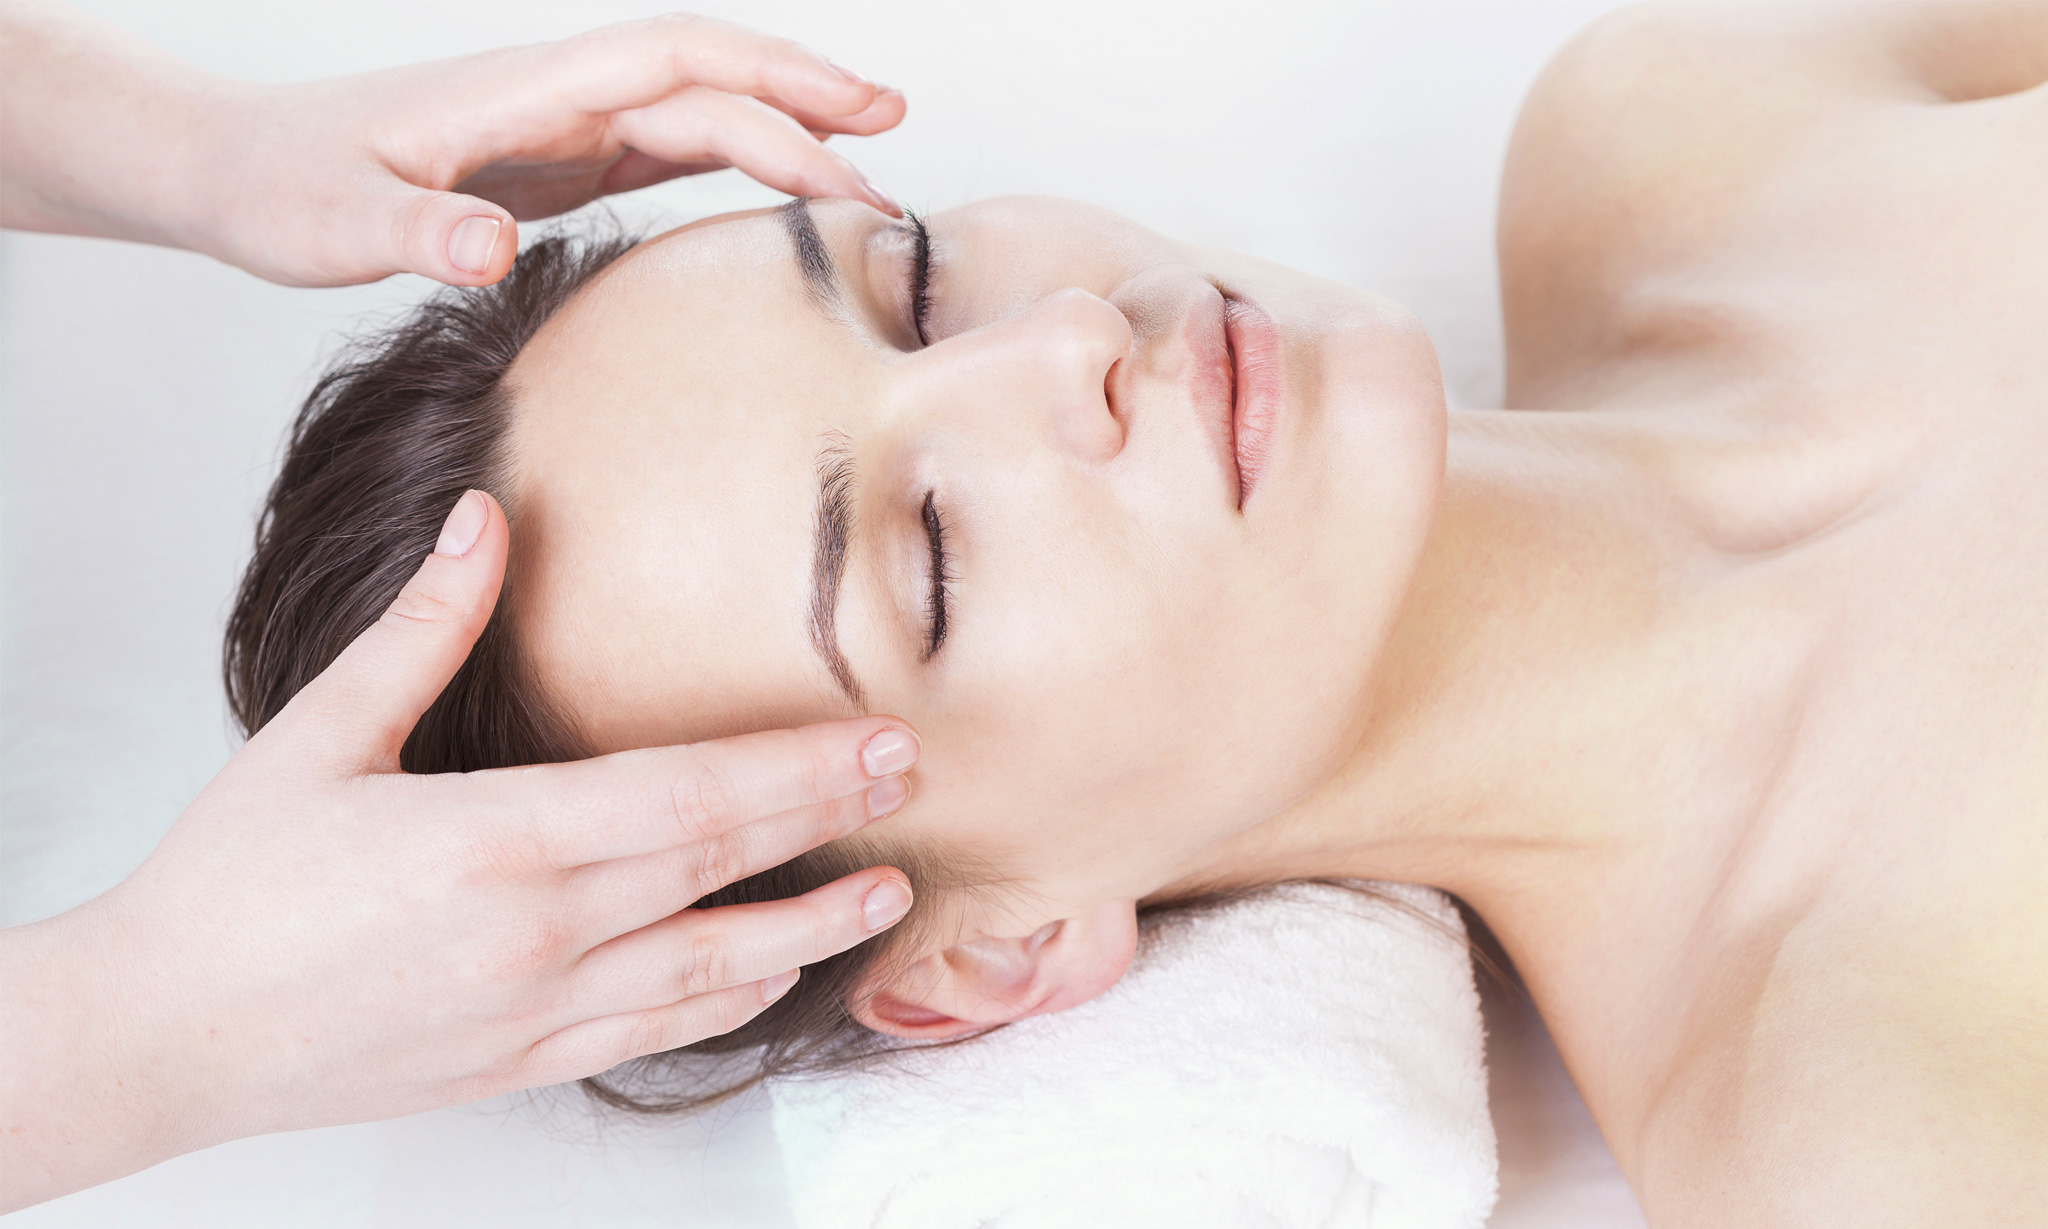 Full Body Massage, Head Massage  More At Akshaya Beauty Salon Spa, Kalyan Nagar -6957